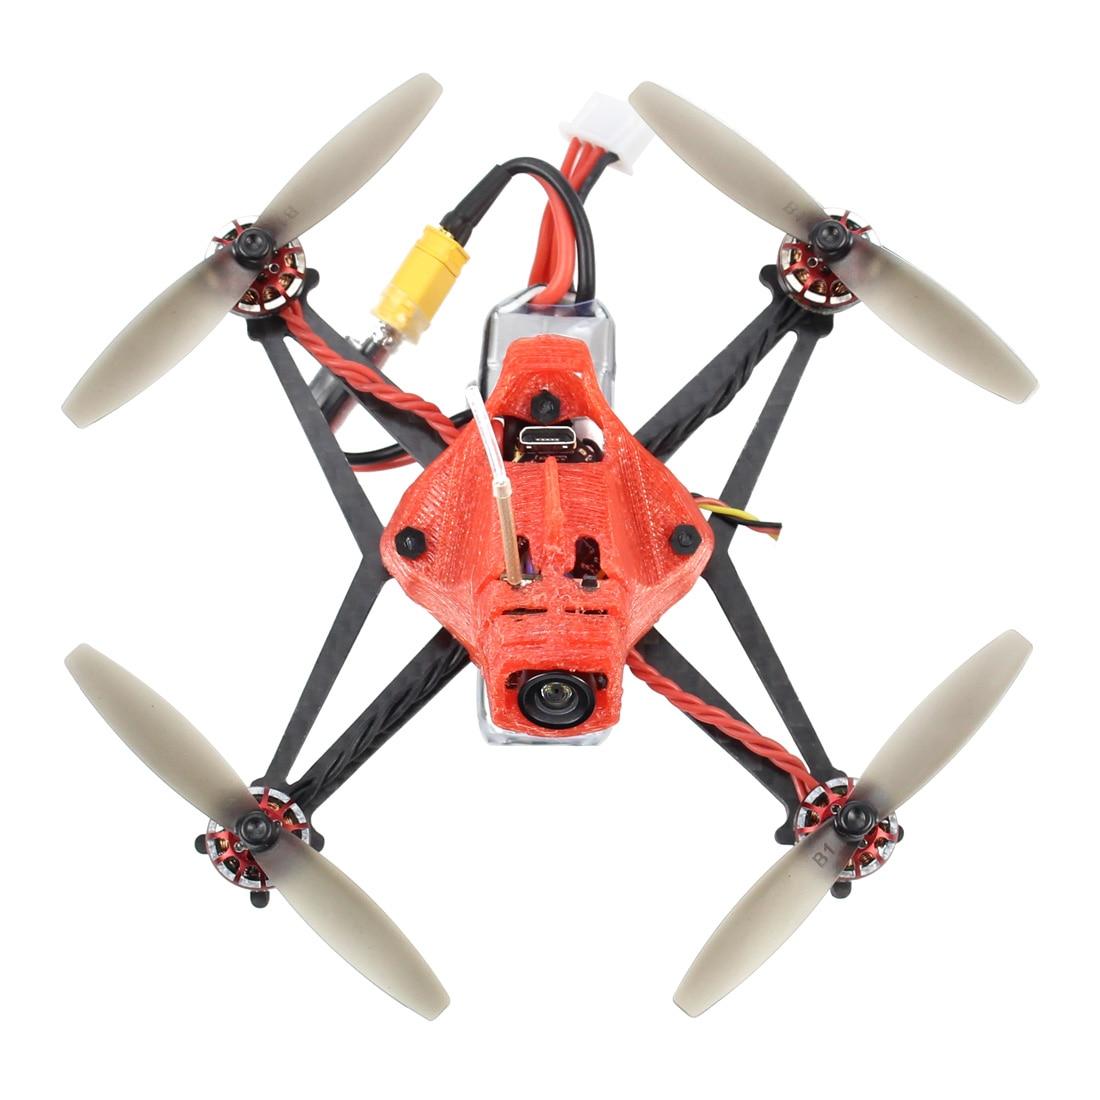 Happymodel Sailfly-X 105mm Crazybee F4 PRO V2.1 AIO Flight Controller 2-3S Micro FPV Racing Drone PNP BNF 25mW VTX 700TVL CameraHappymodel Sailfly-X 105mm Crazybee F4 PRO V2.1 AIO Flight Controller 2-3S Micro FPV Racing Drone PNP BNF 25mW VTX 700TVL Camera